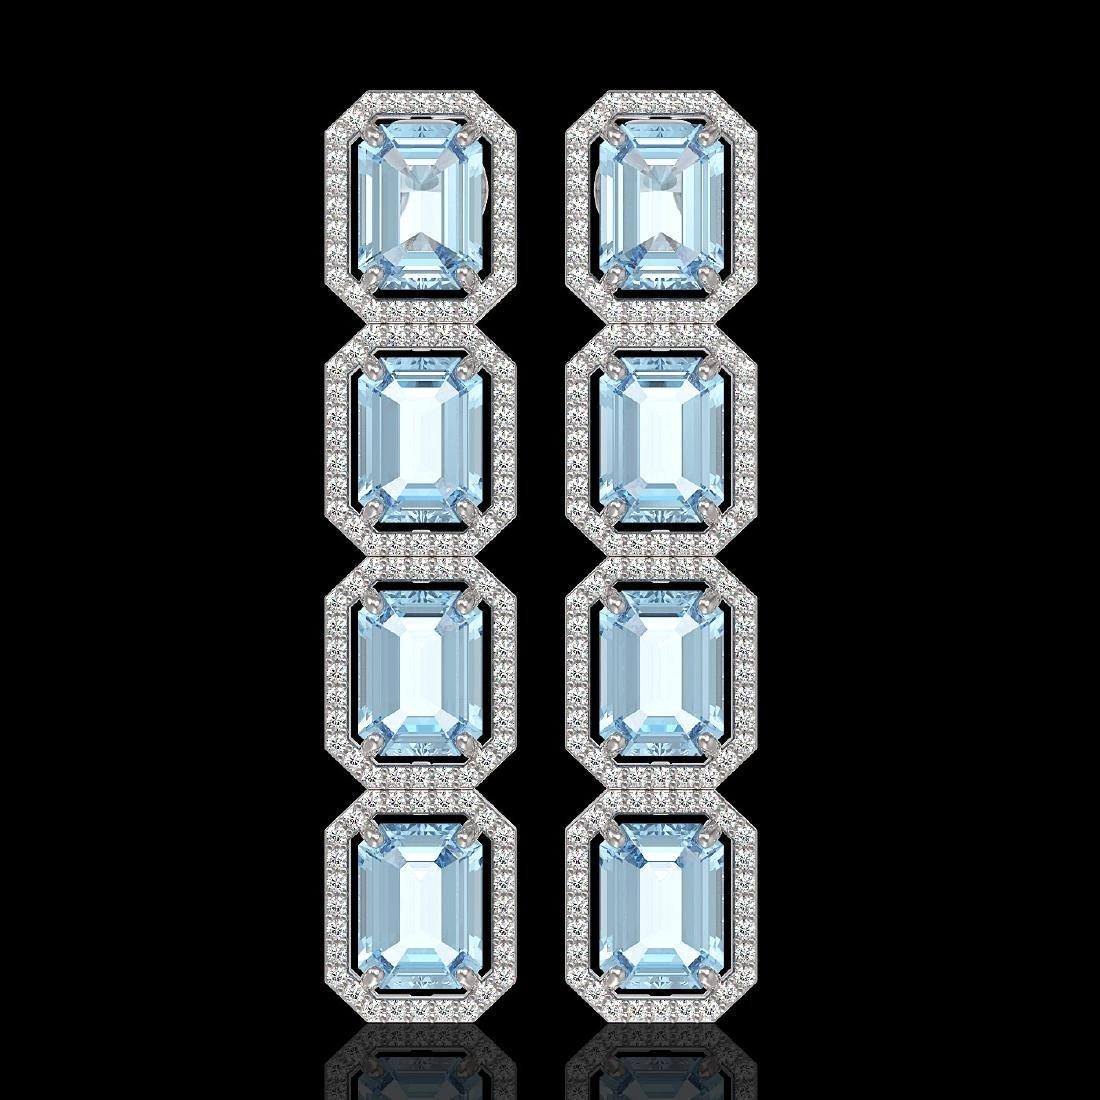 19.49 CTW Aquamarine & Diamond Halo Earrings 10K White